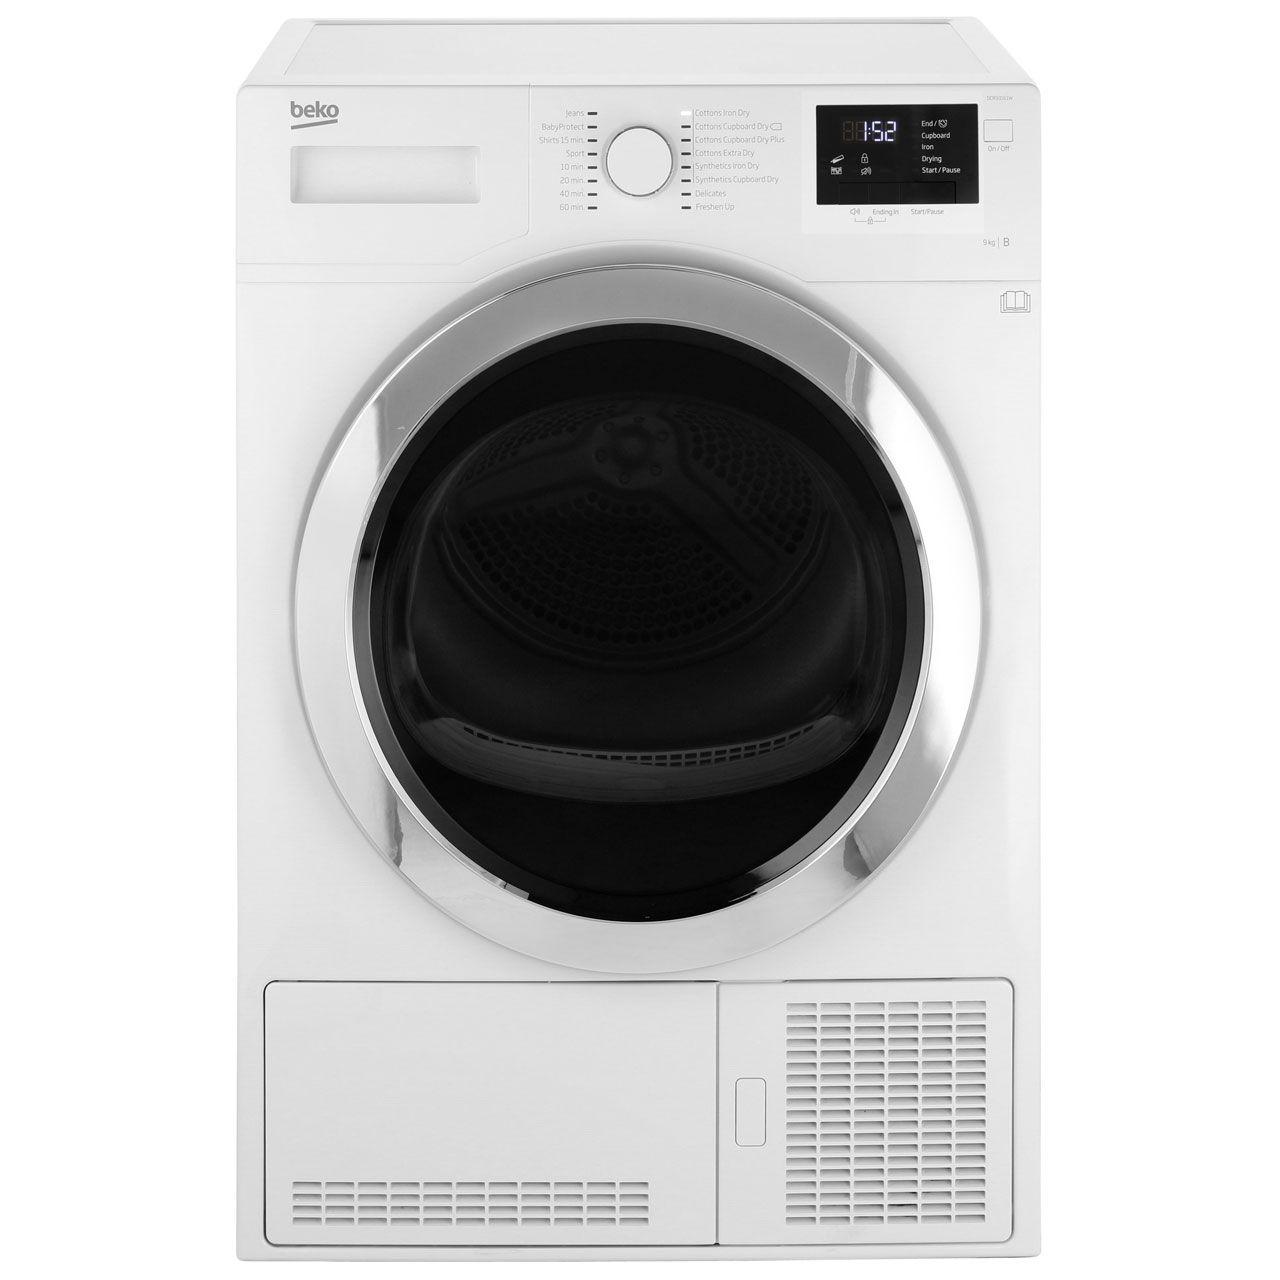 Beko Dcr93161w 9kg Condenser Tumble Dryer White B Rated